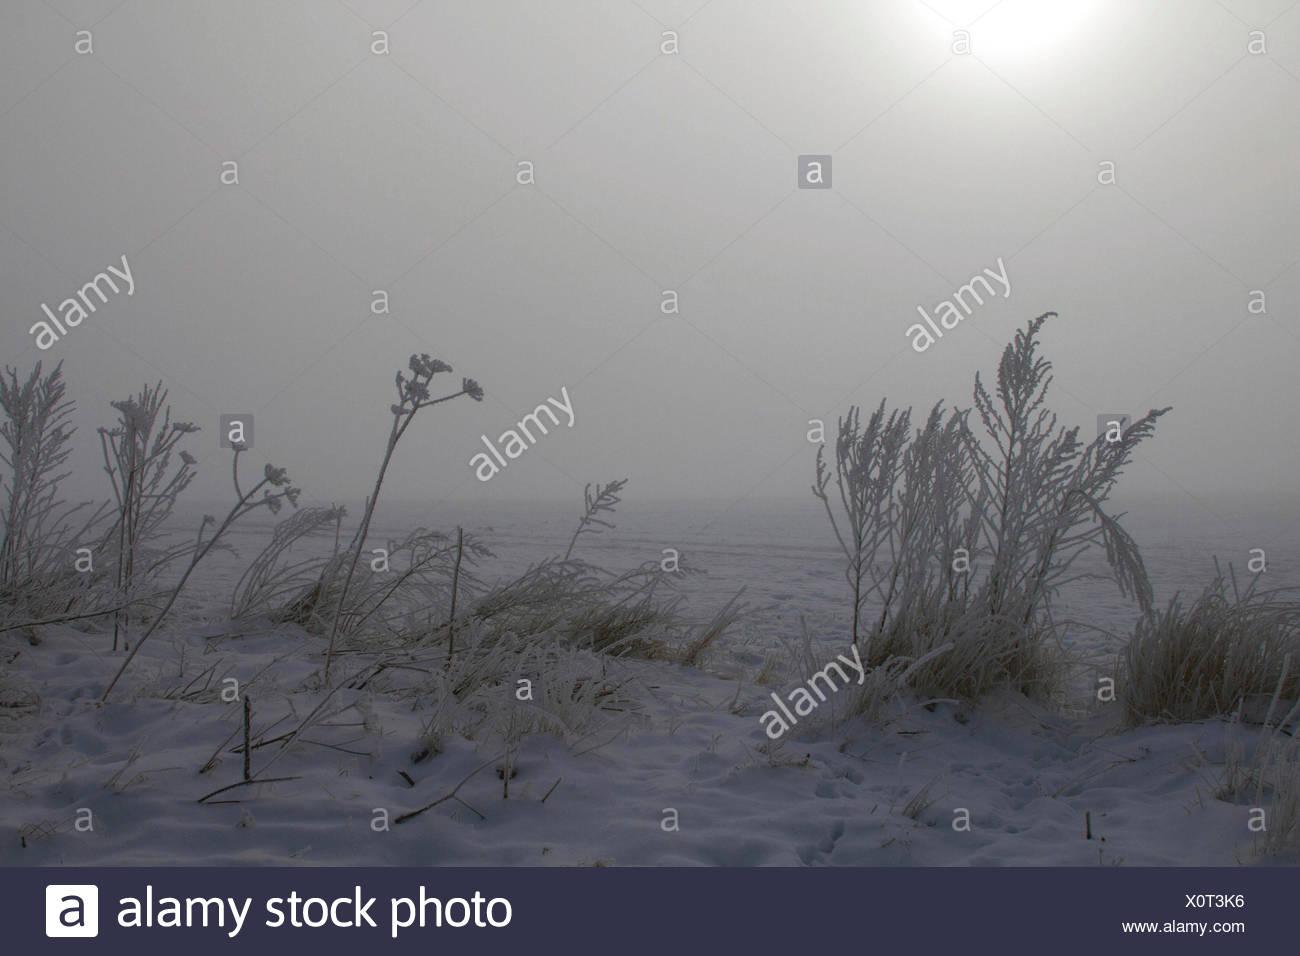 hoar frost at sunrise in mist, Germany, Mecklenburg-Western Pomerania Stock Photo